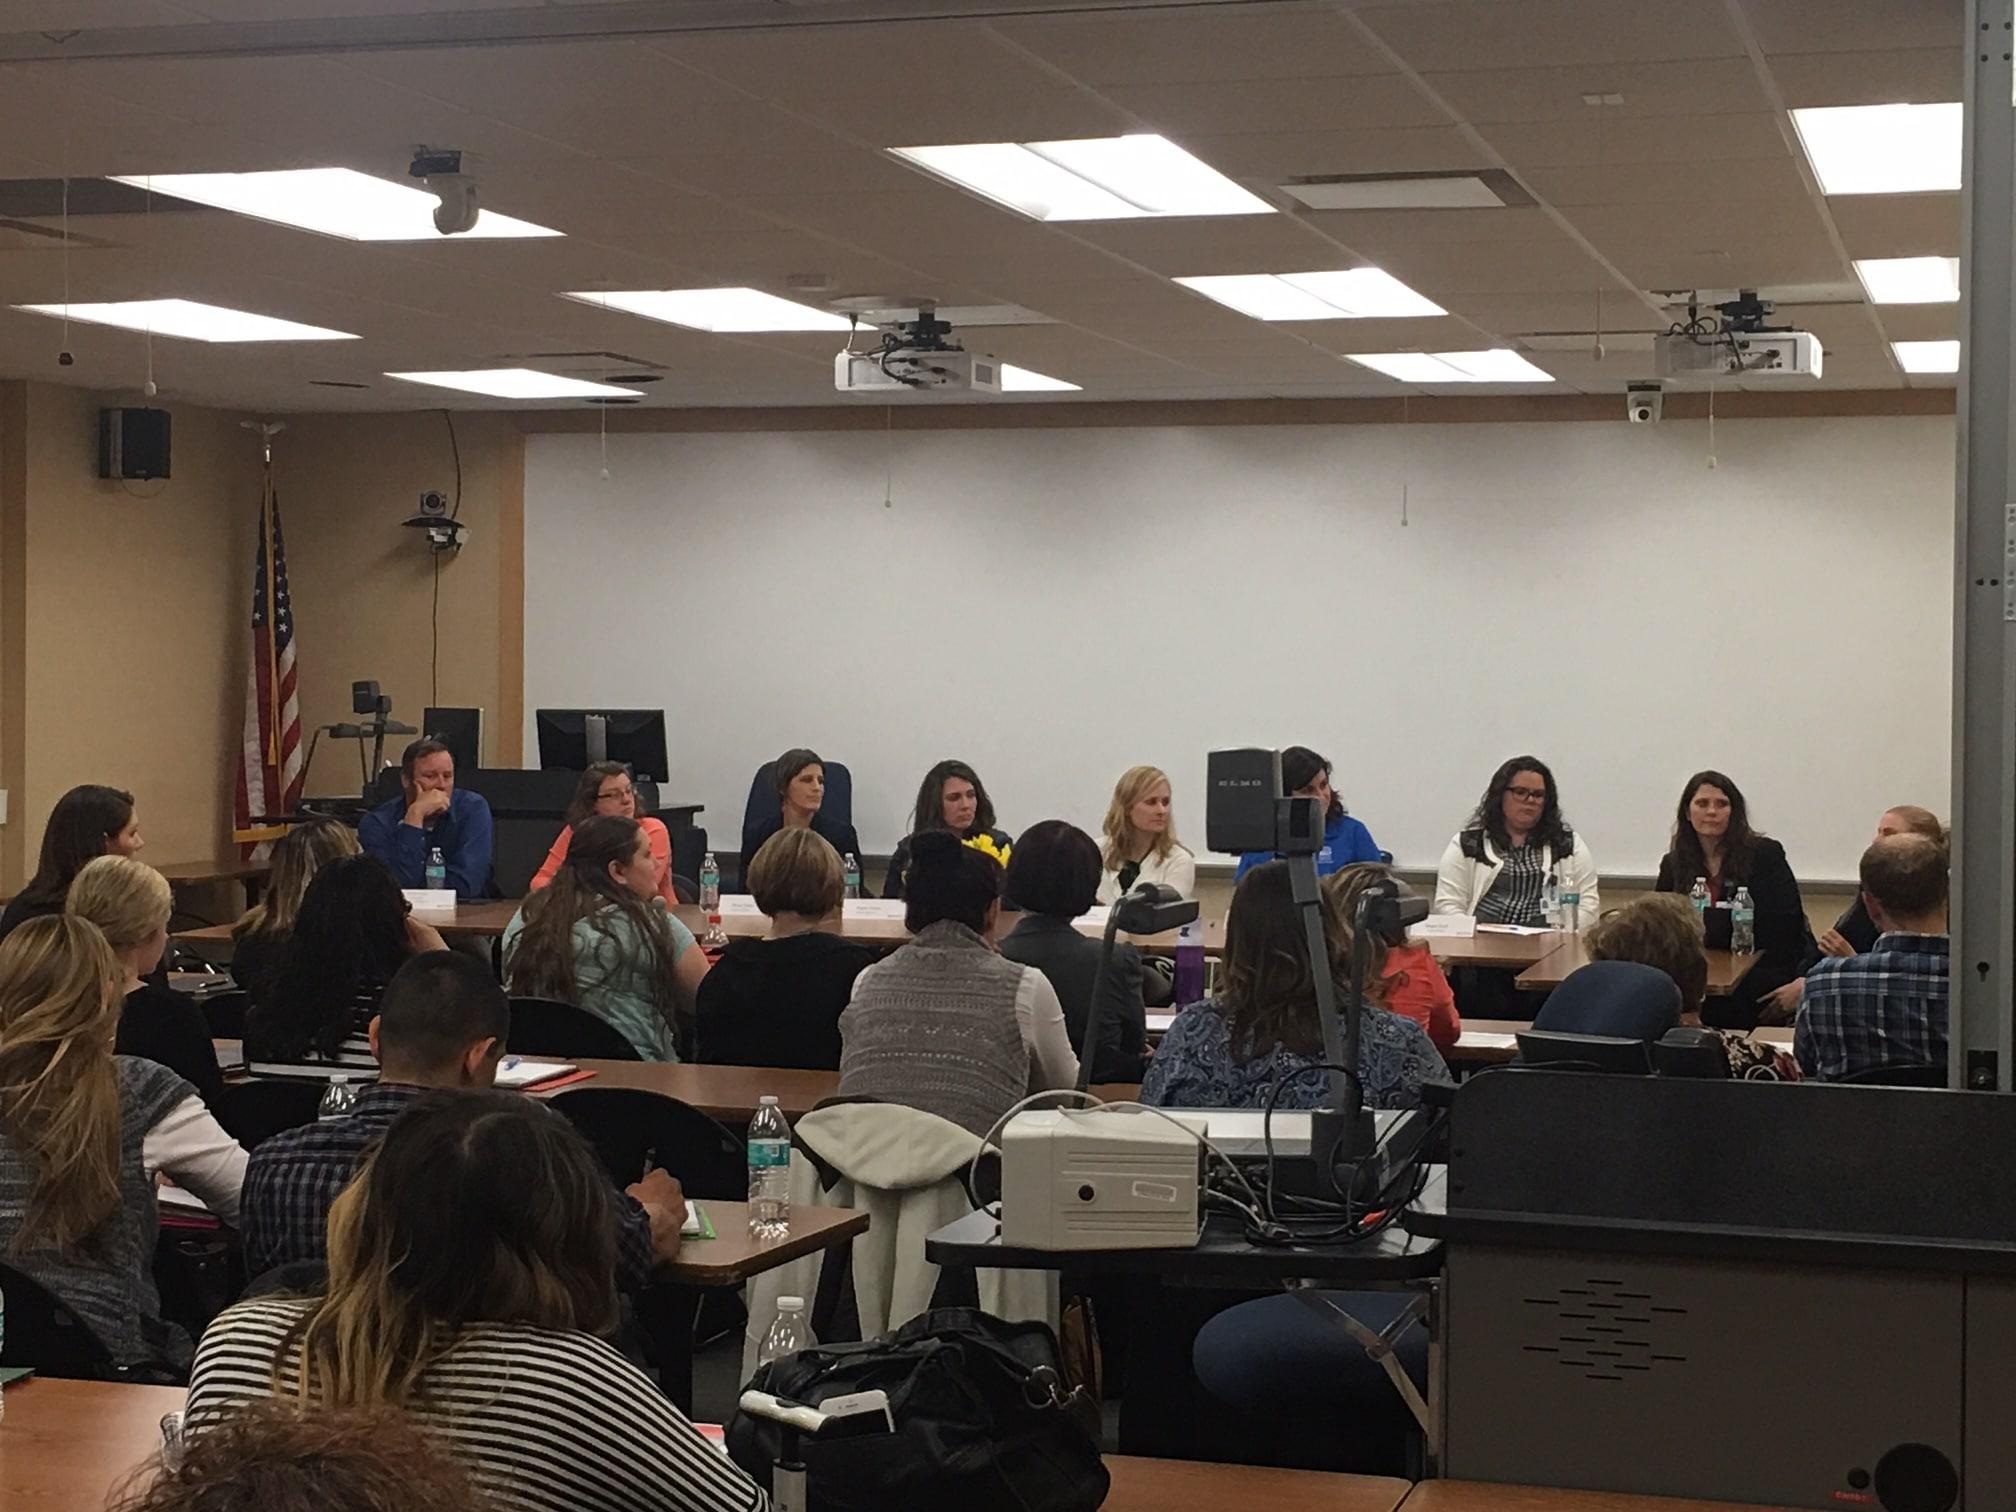 attendees listen to local employers speak